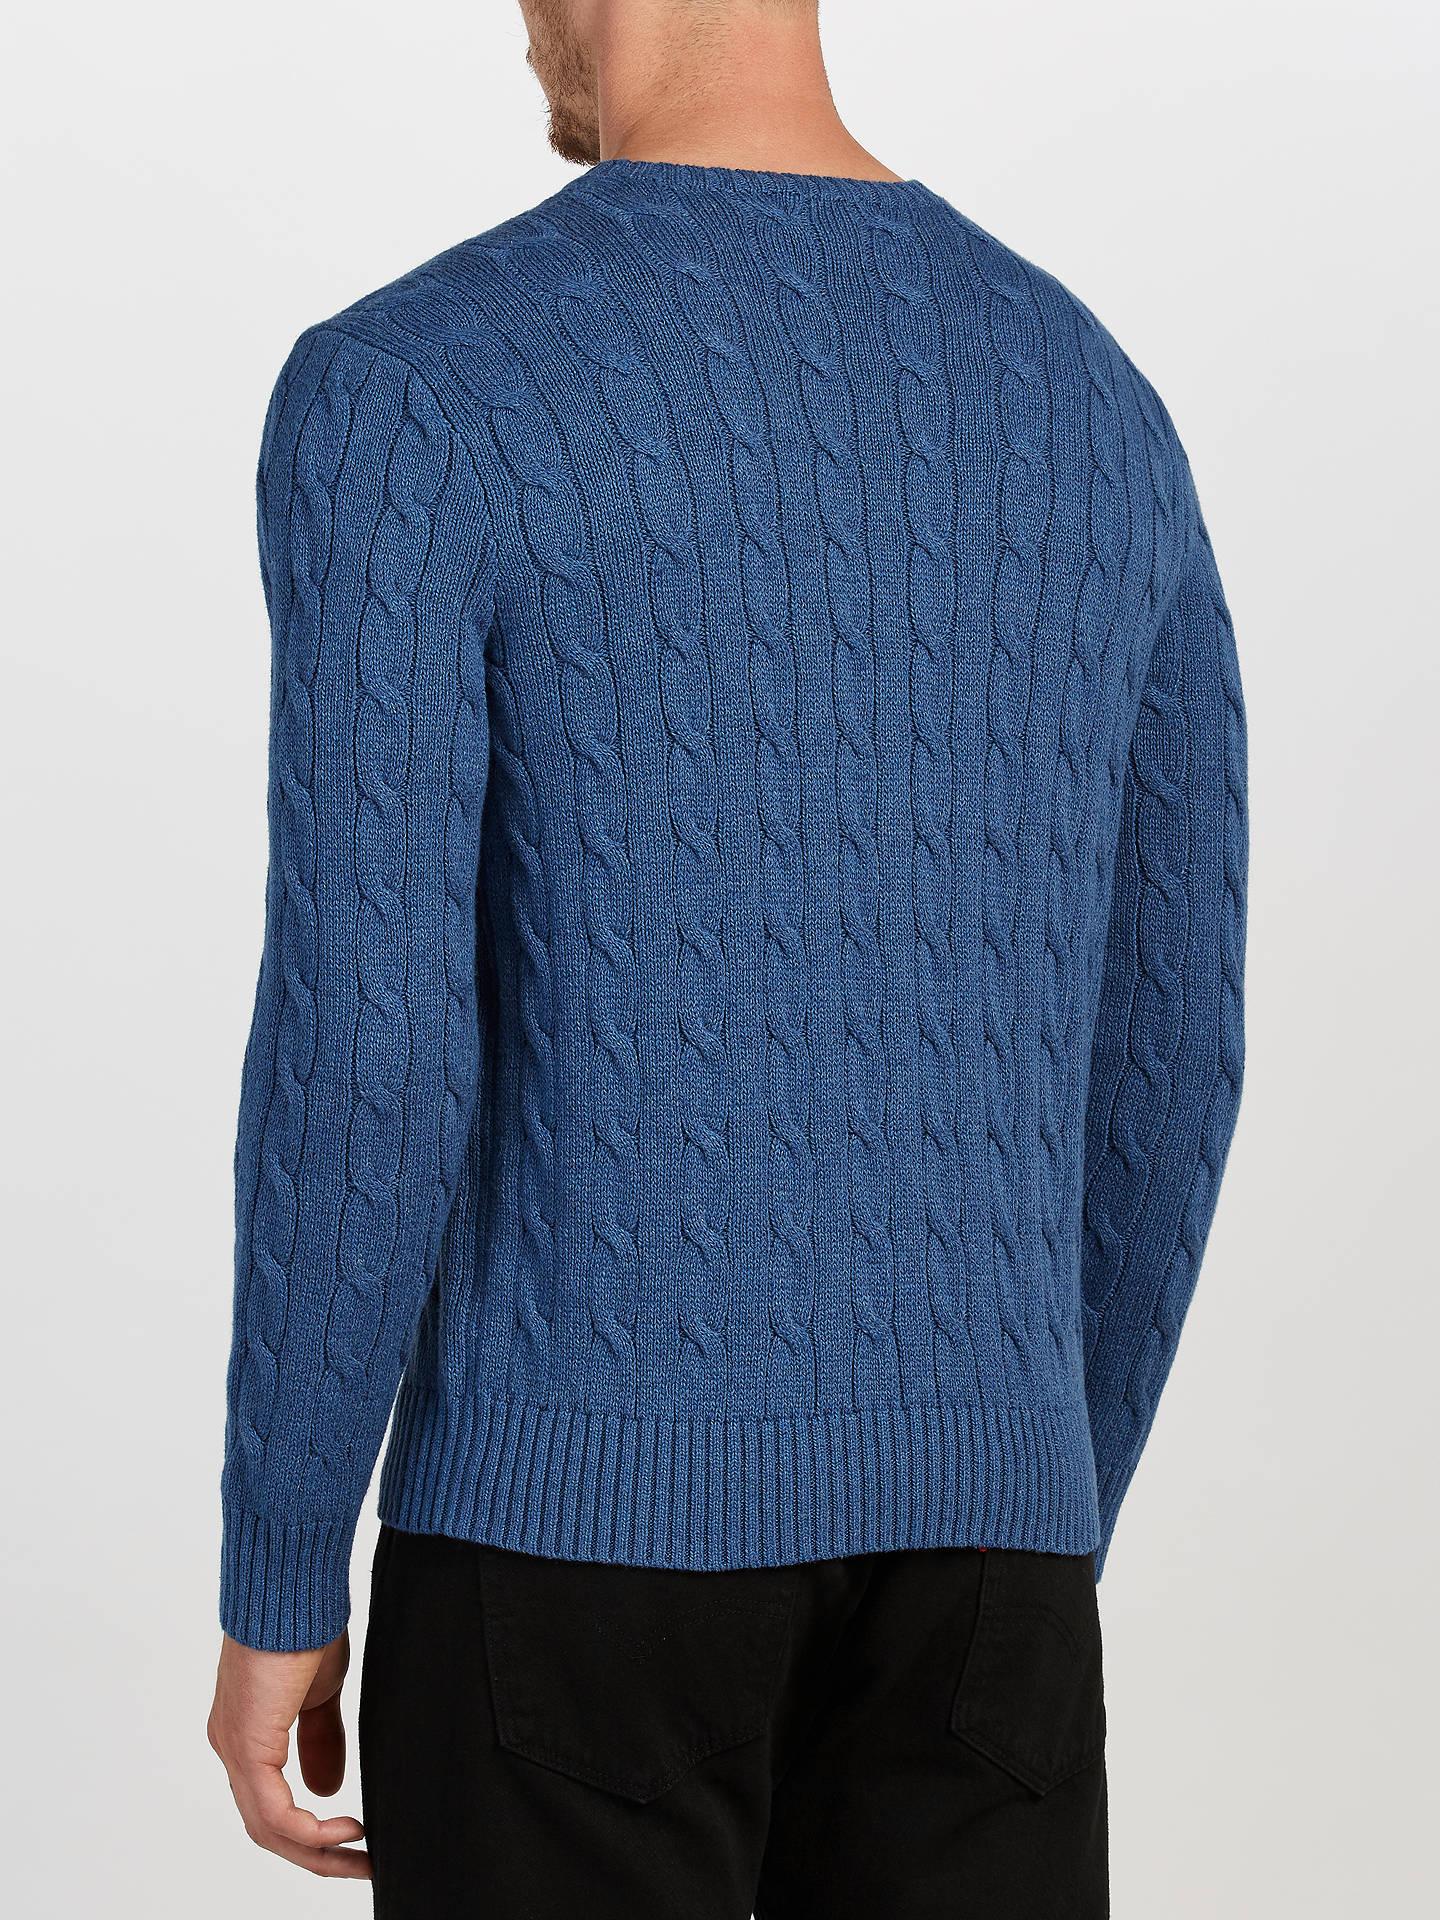 37316b9d8f157 Polo Ralph Lauren Cable Knit Crew Neck Jumper at John Lewis   Partners